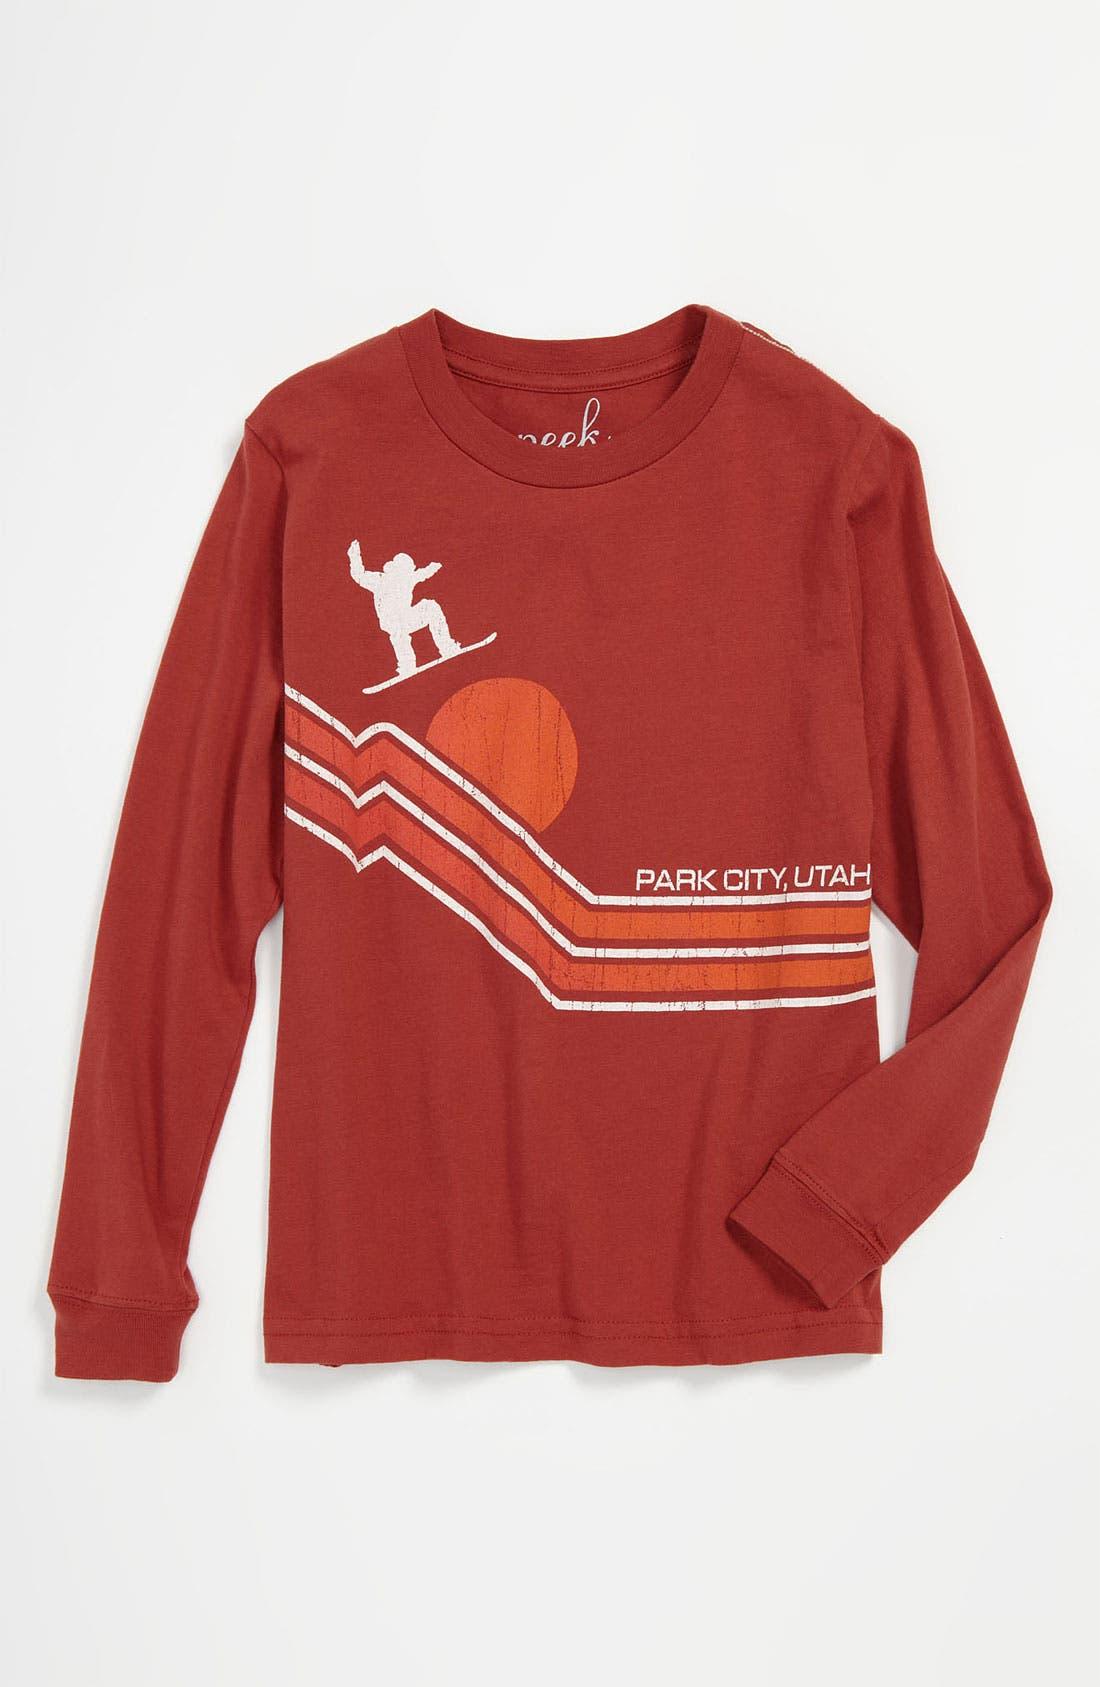 Alternate Image 1 Selected - Peek 'Park City' T-Shirt (Toddler, Little Boys & Big Boys)